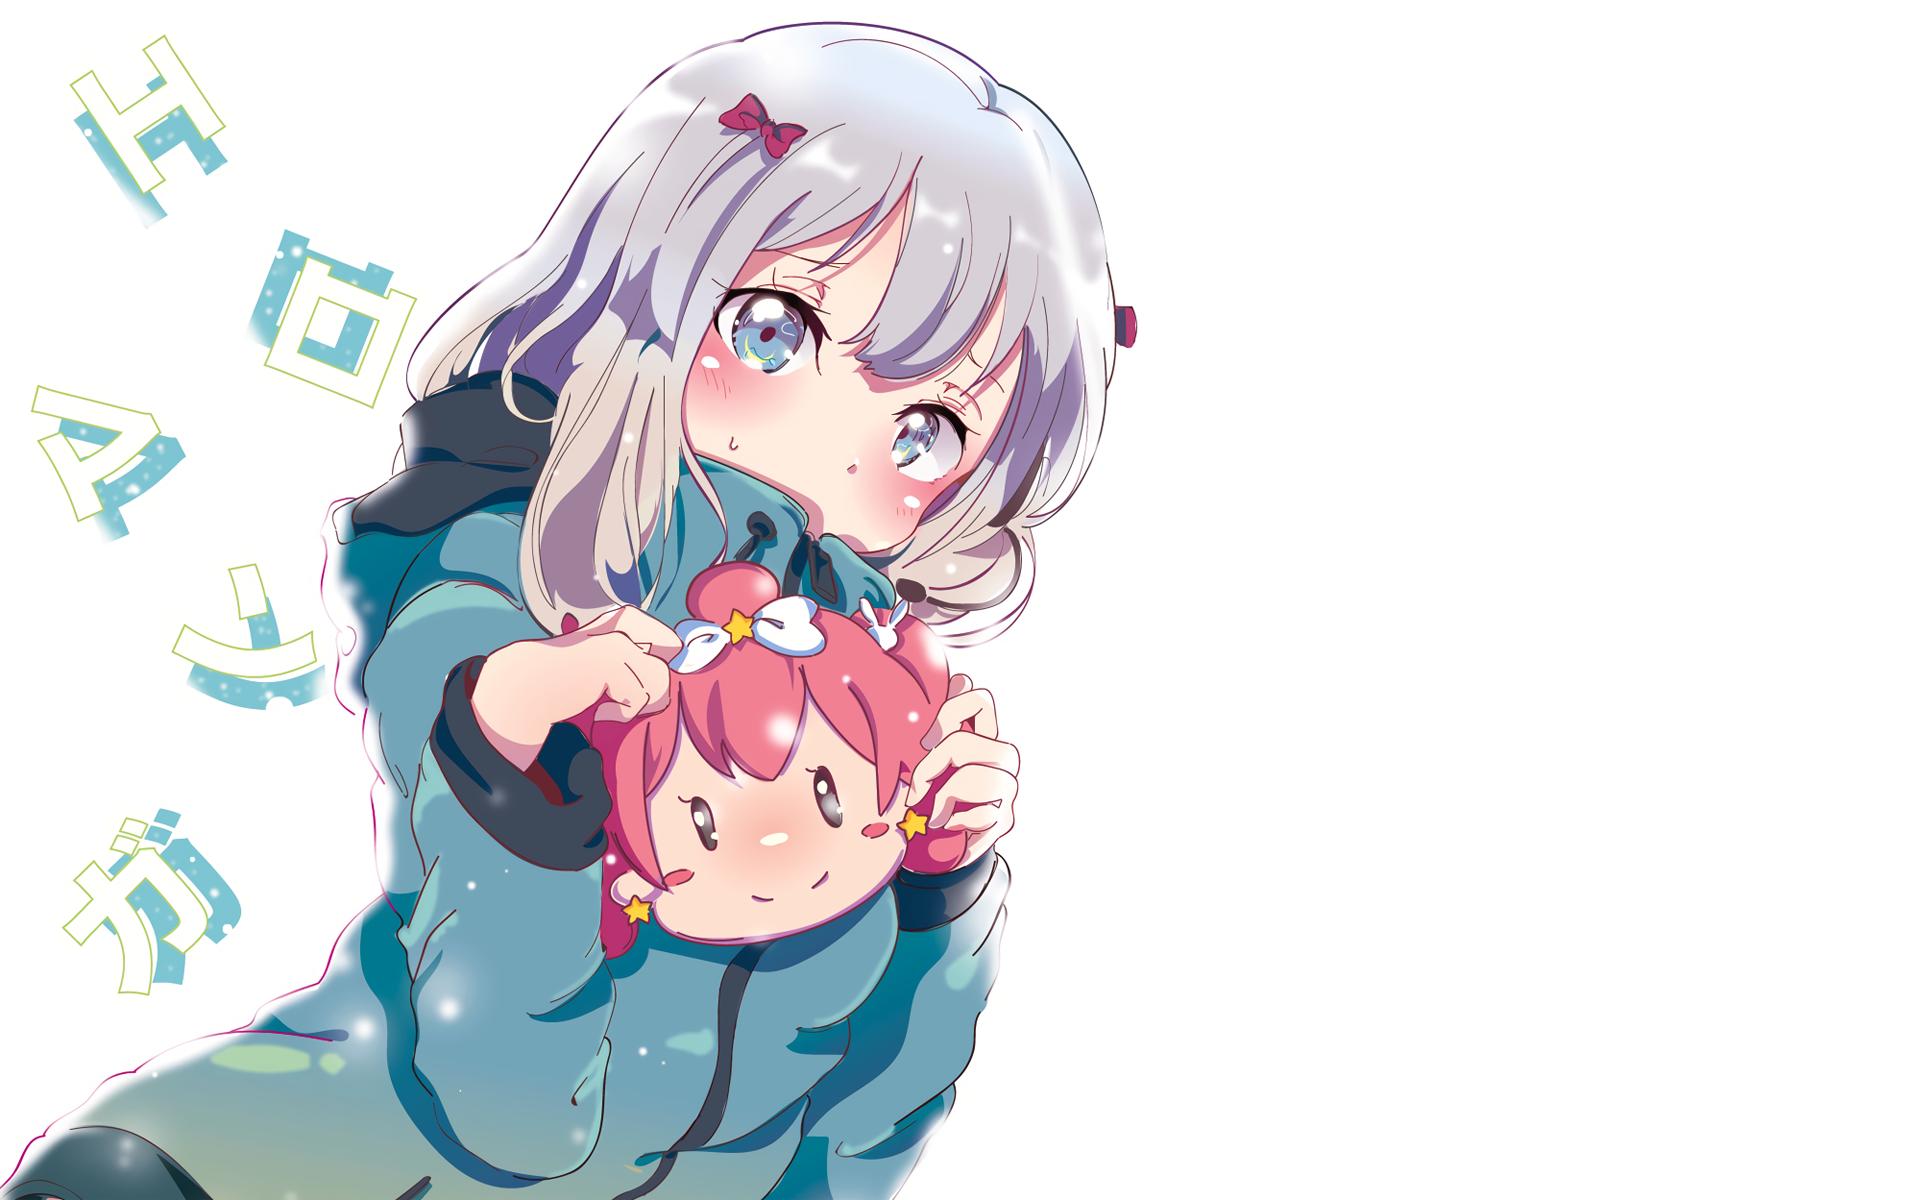 Eromanga Sensei Anime Wallpapers Hd K Download For